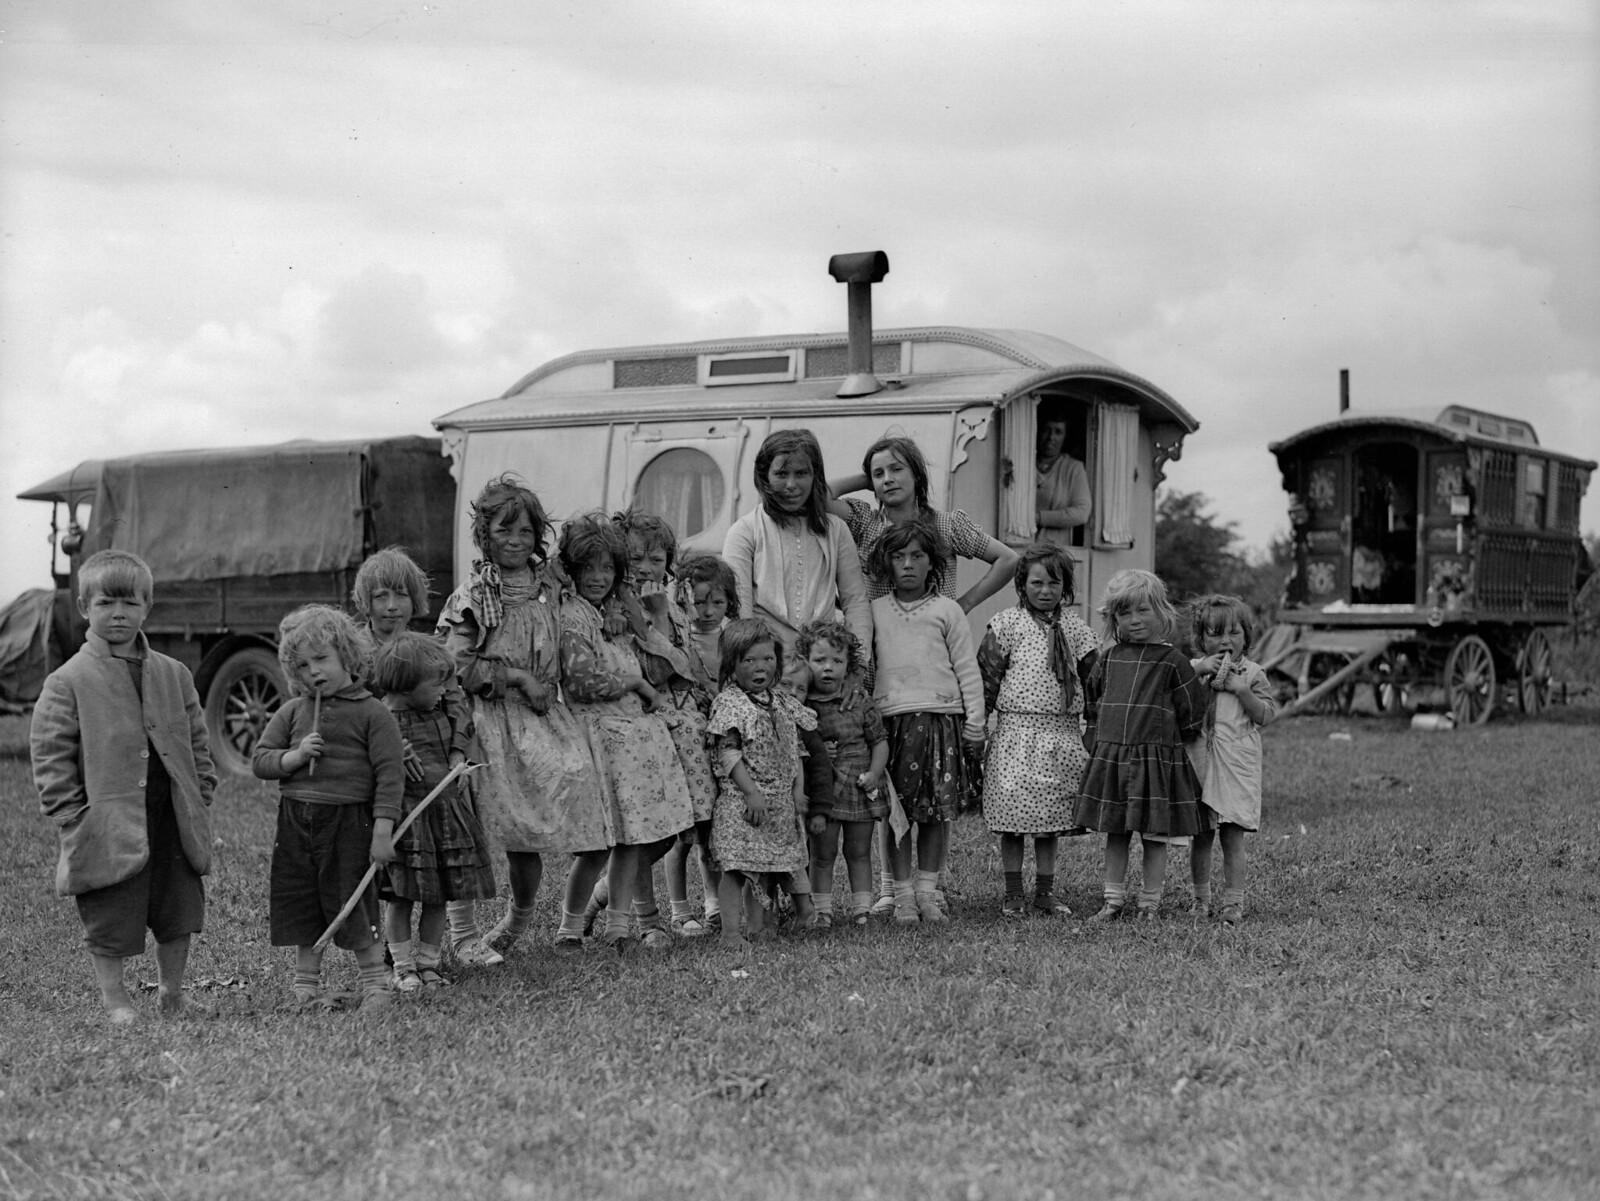 1931. Цыганские дети возле каравана на холмах Эпсома.  2 июня